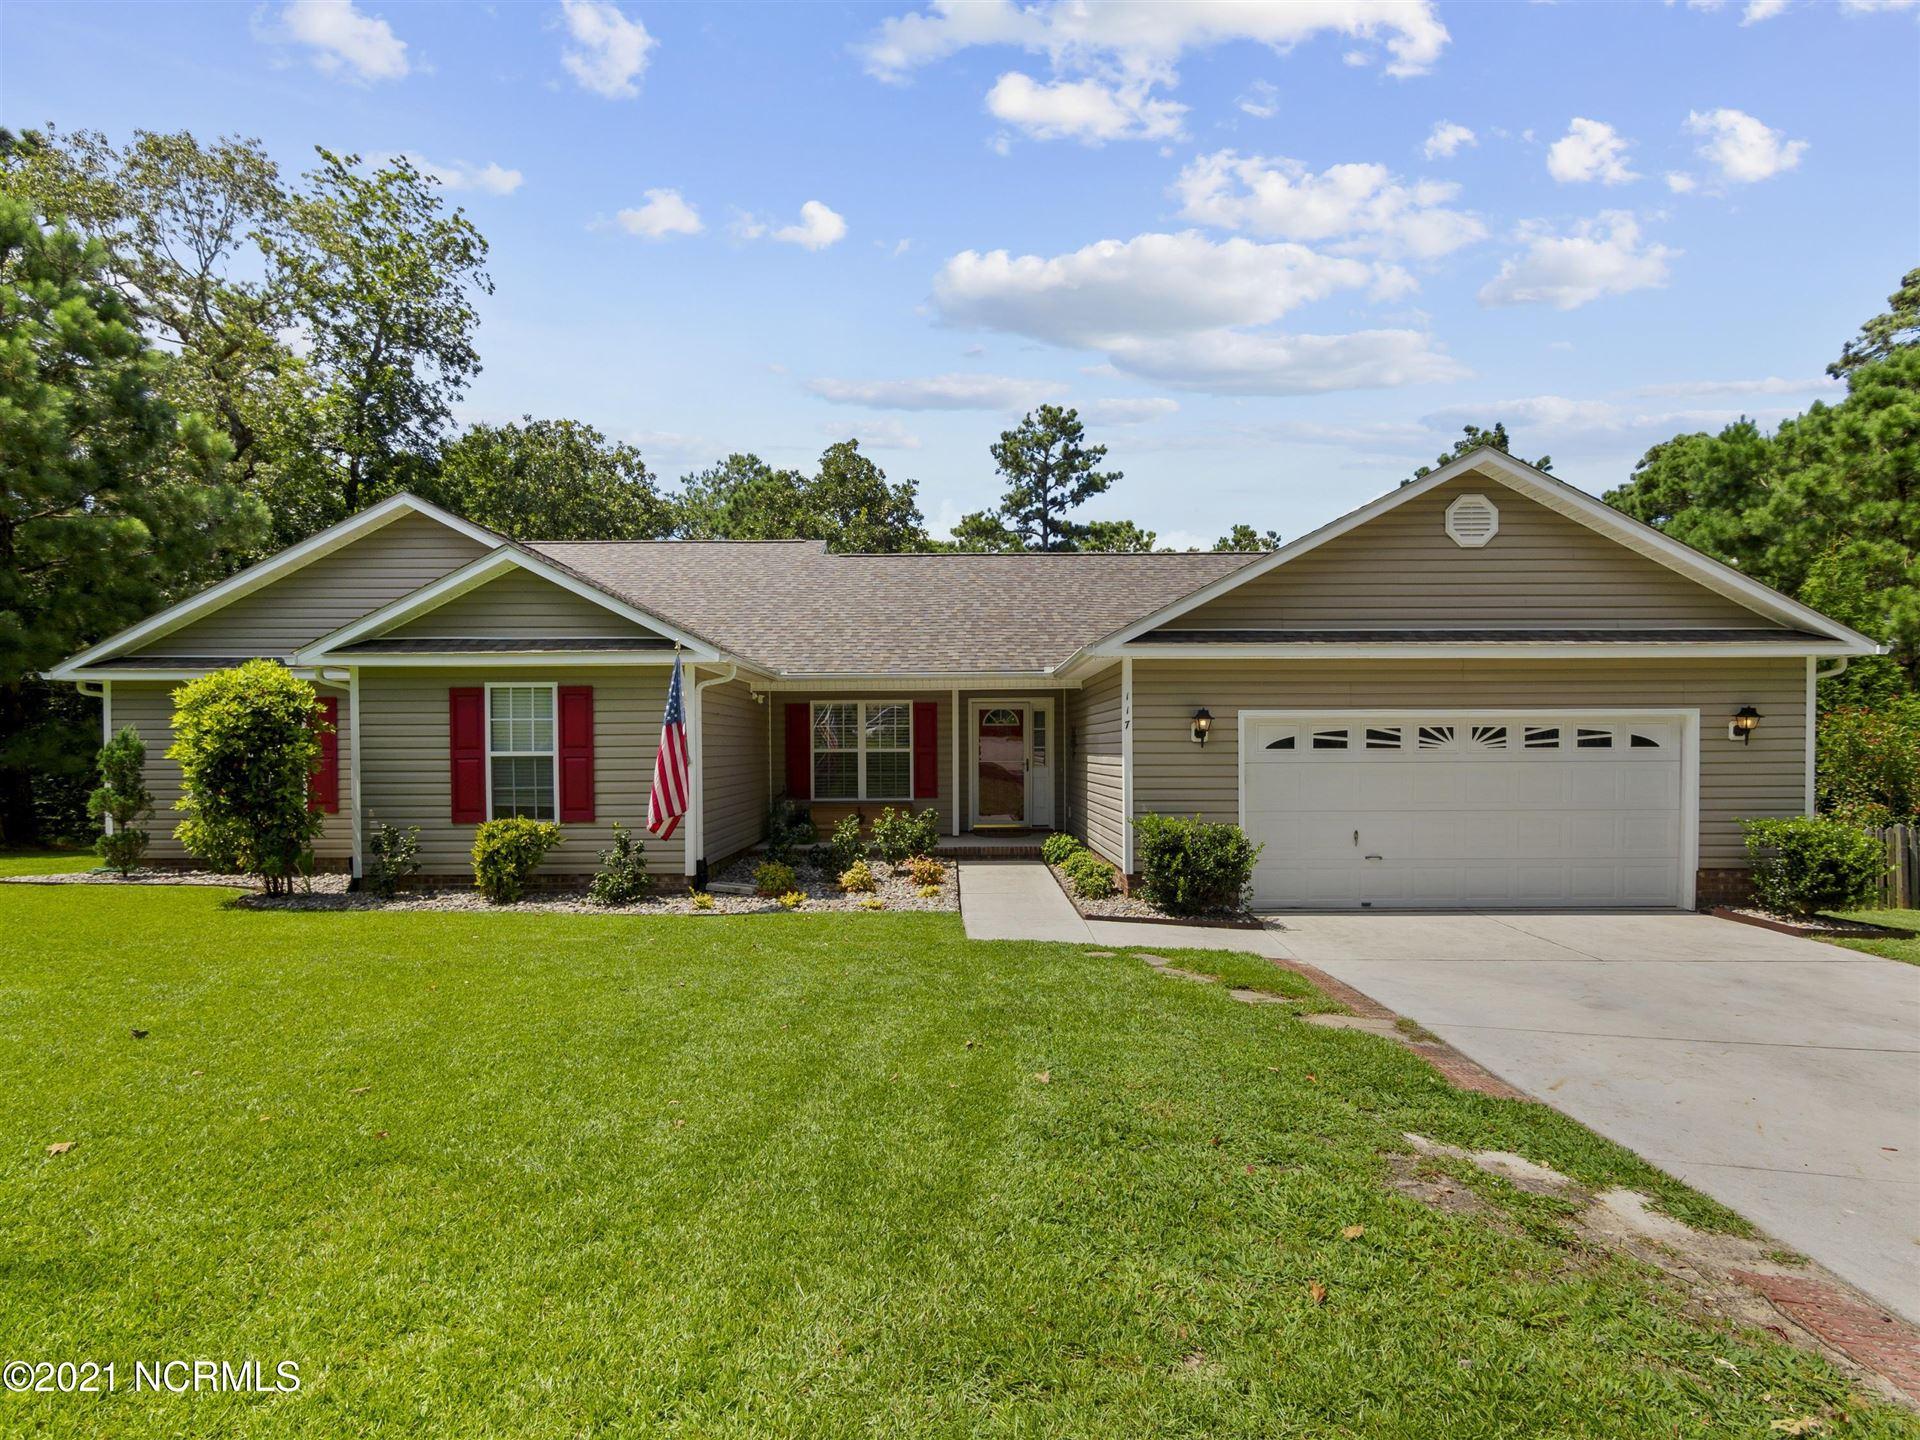 Photo of 117 Halls Creek Drive, Swansboro, NC 28584 (MLS # 100285069)